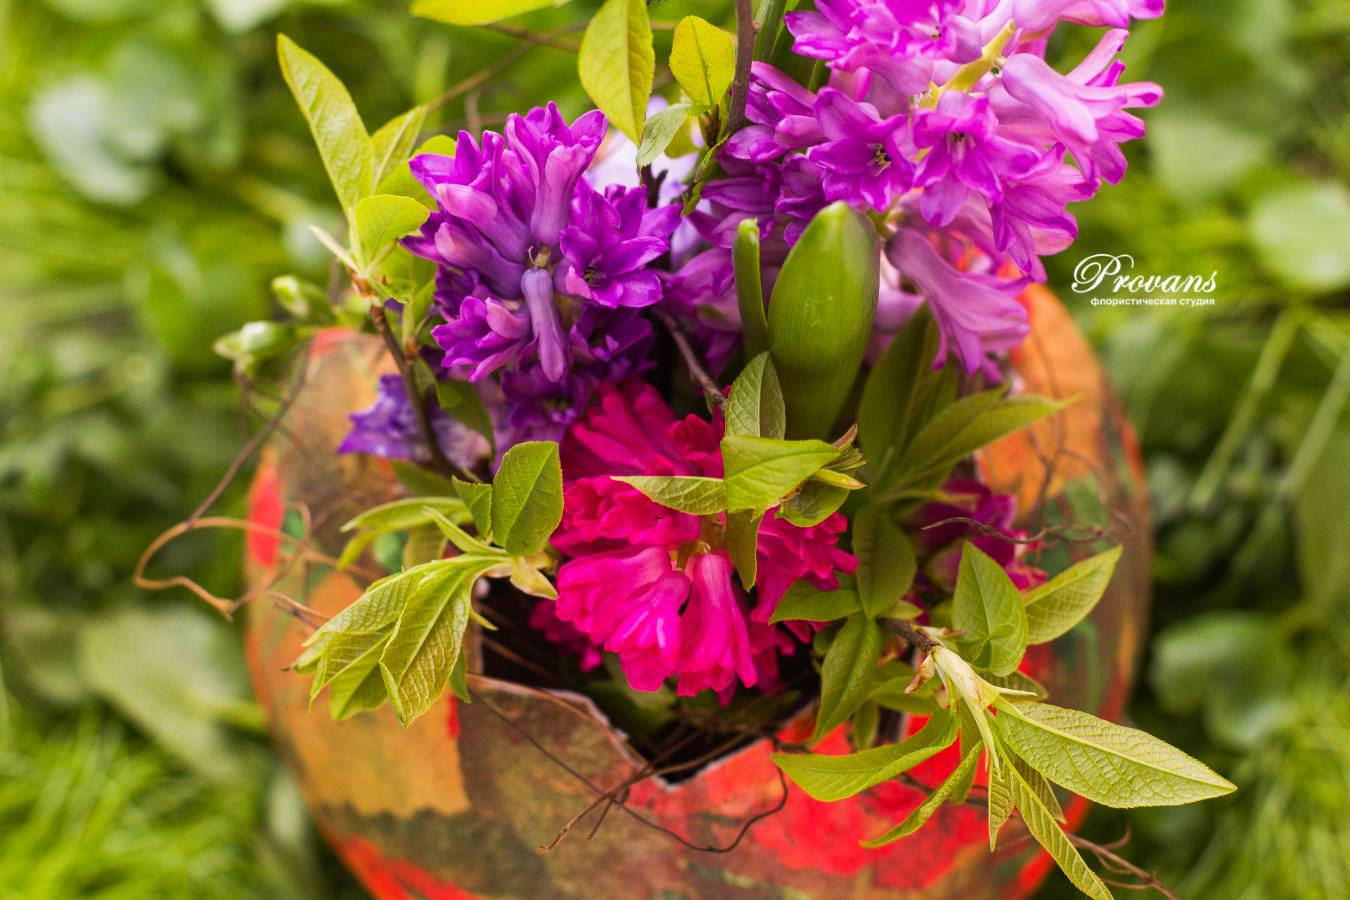 Композиция на Пасху. Цветы: гиацинт